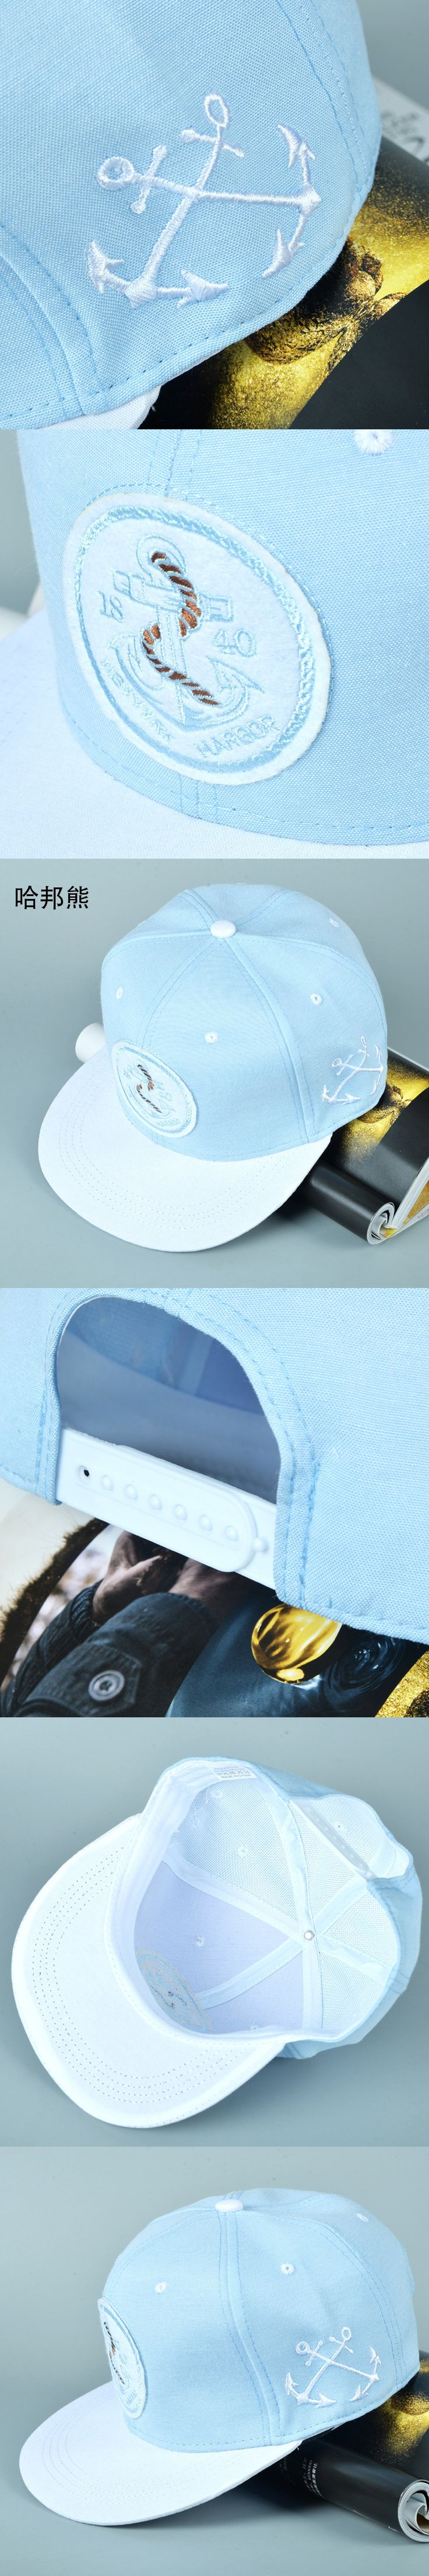 2017 anchor patch bone snapback 1840 new york harbor hiphop baseball cap fashion casquette adjustable hat gorras for women men